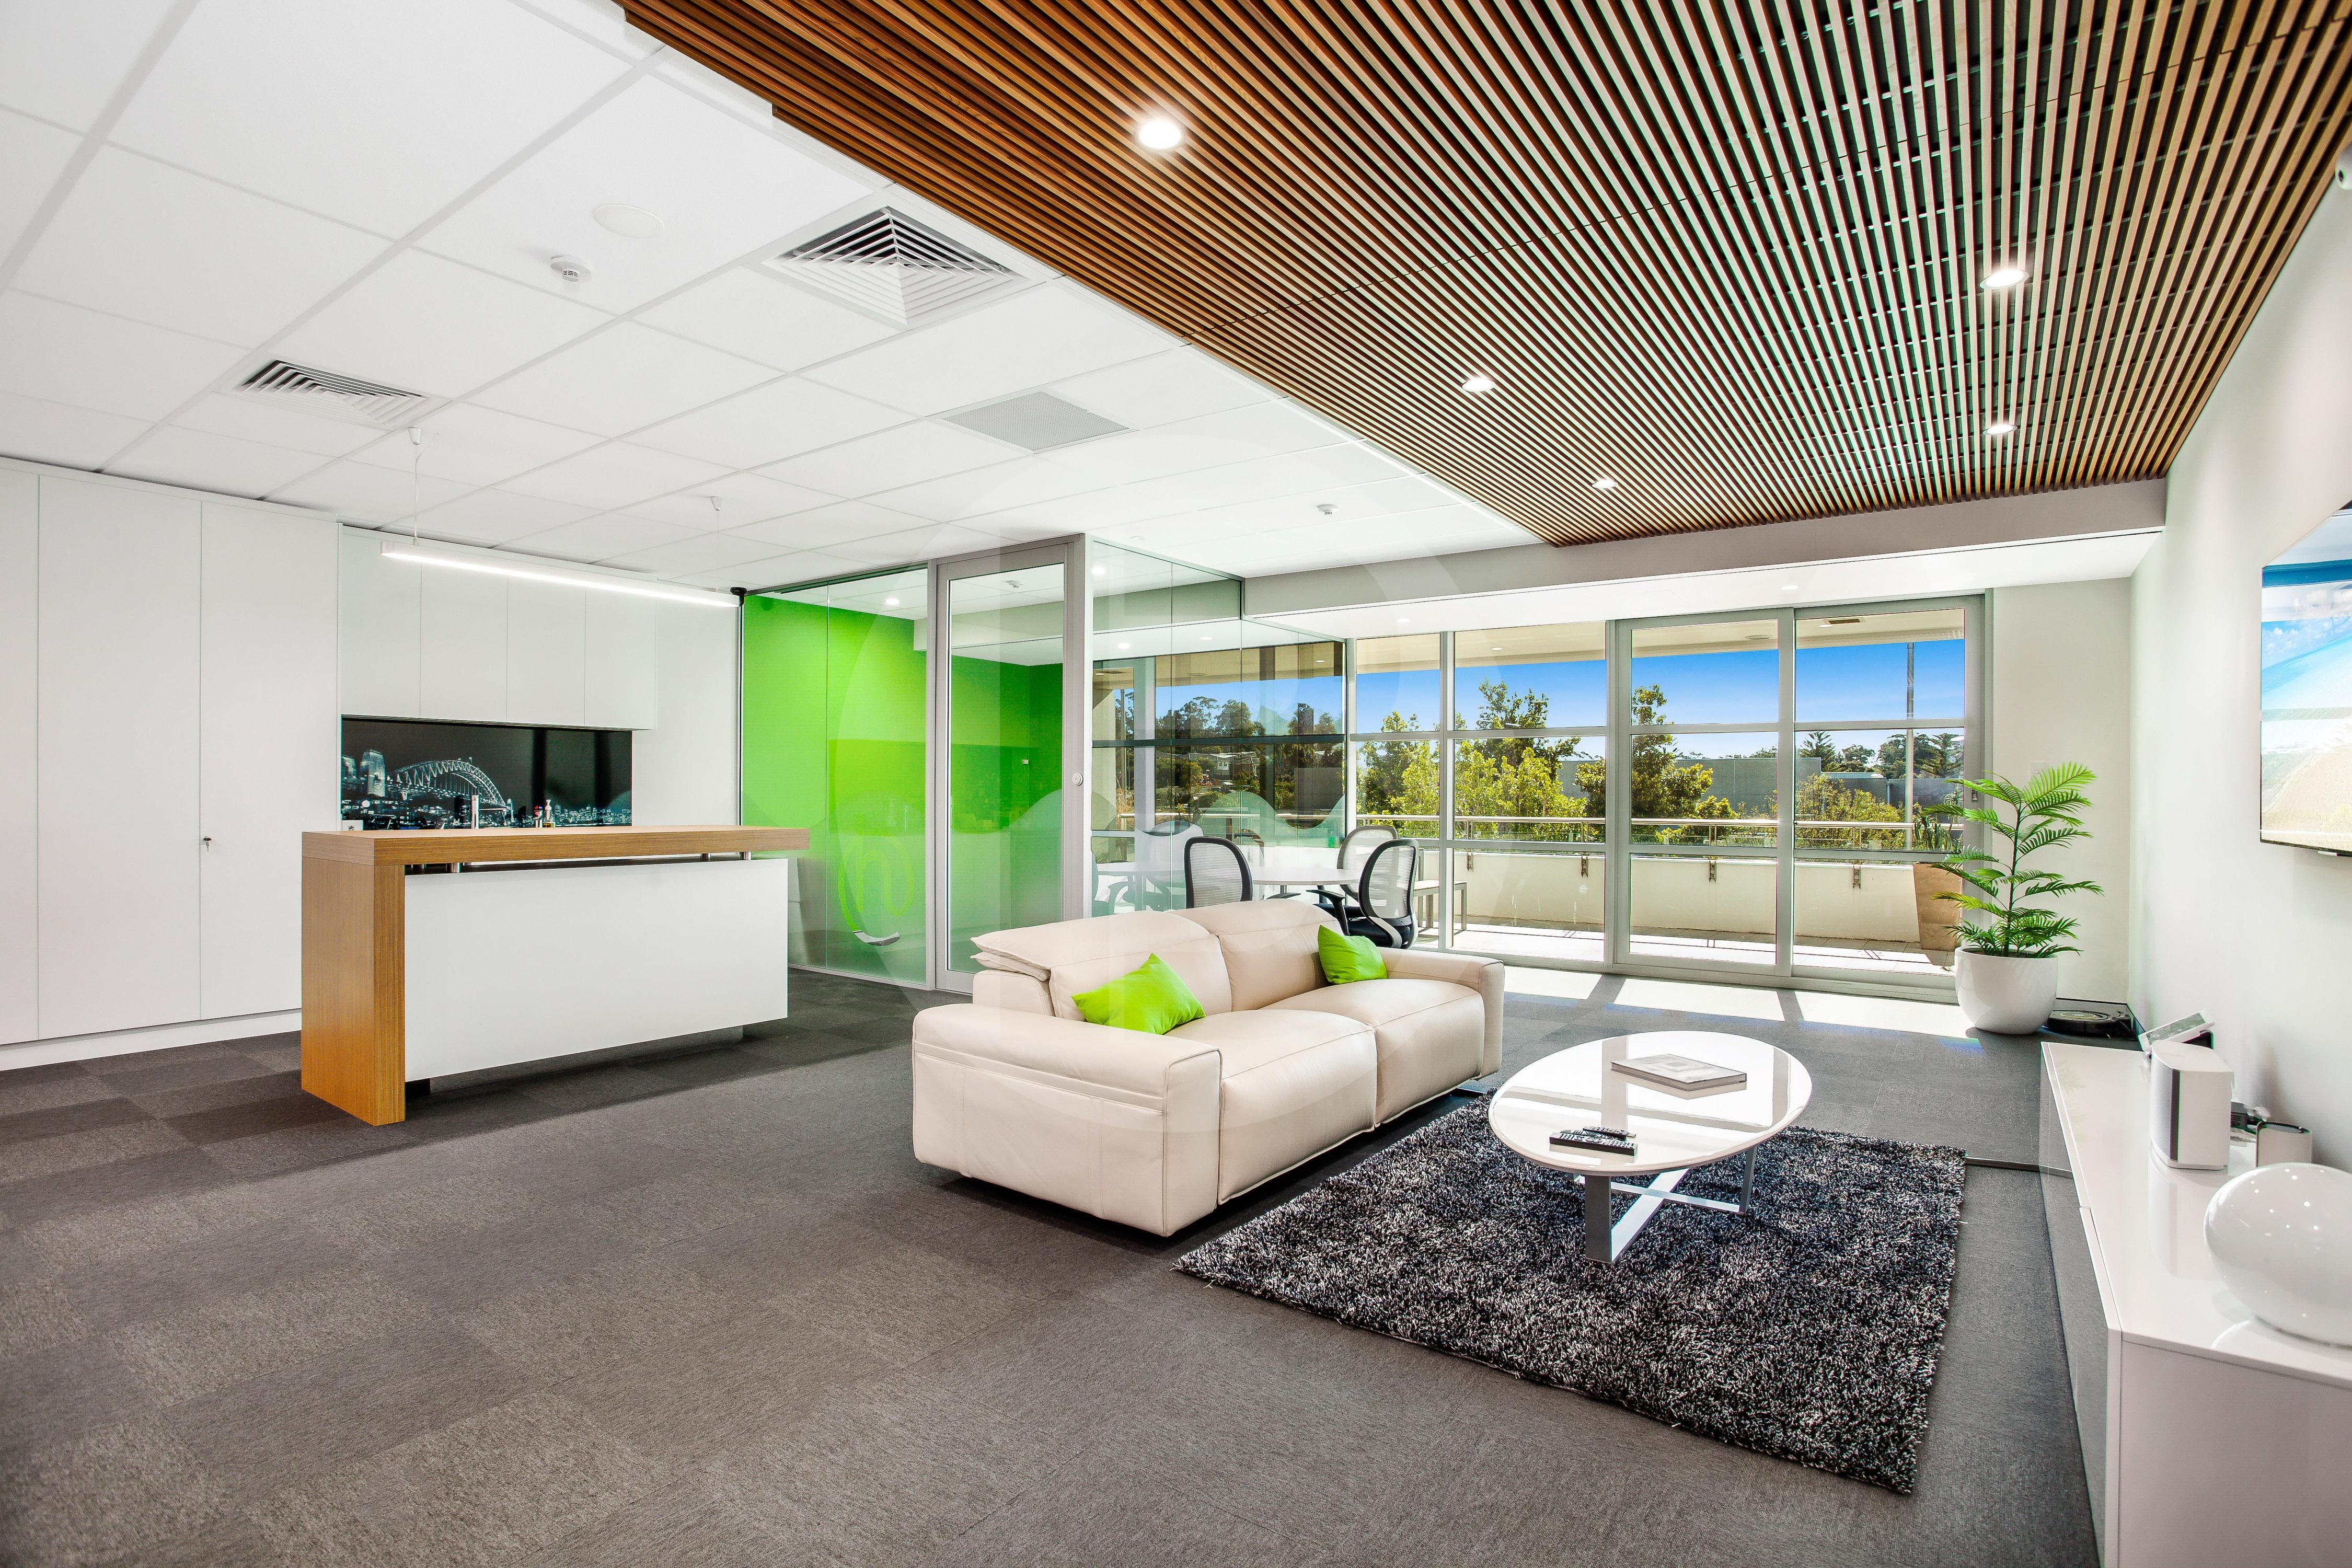 FANTASTIC OFFICE WORKPLACE | BAULKHAM HILLS